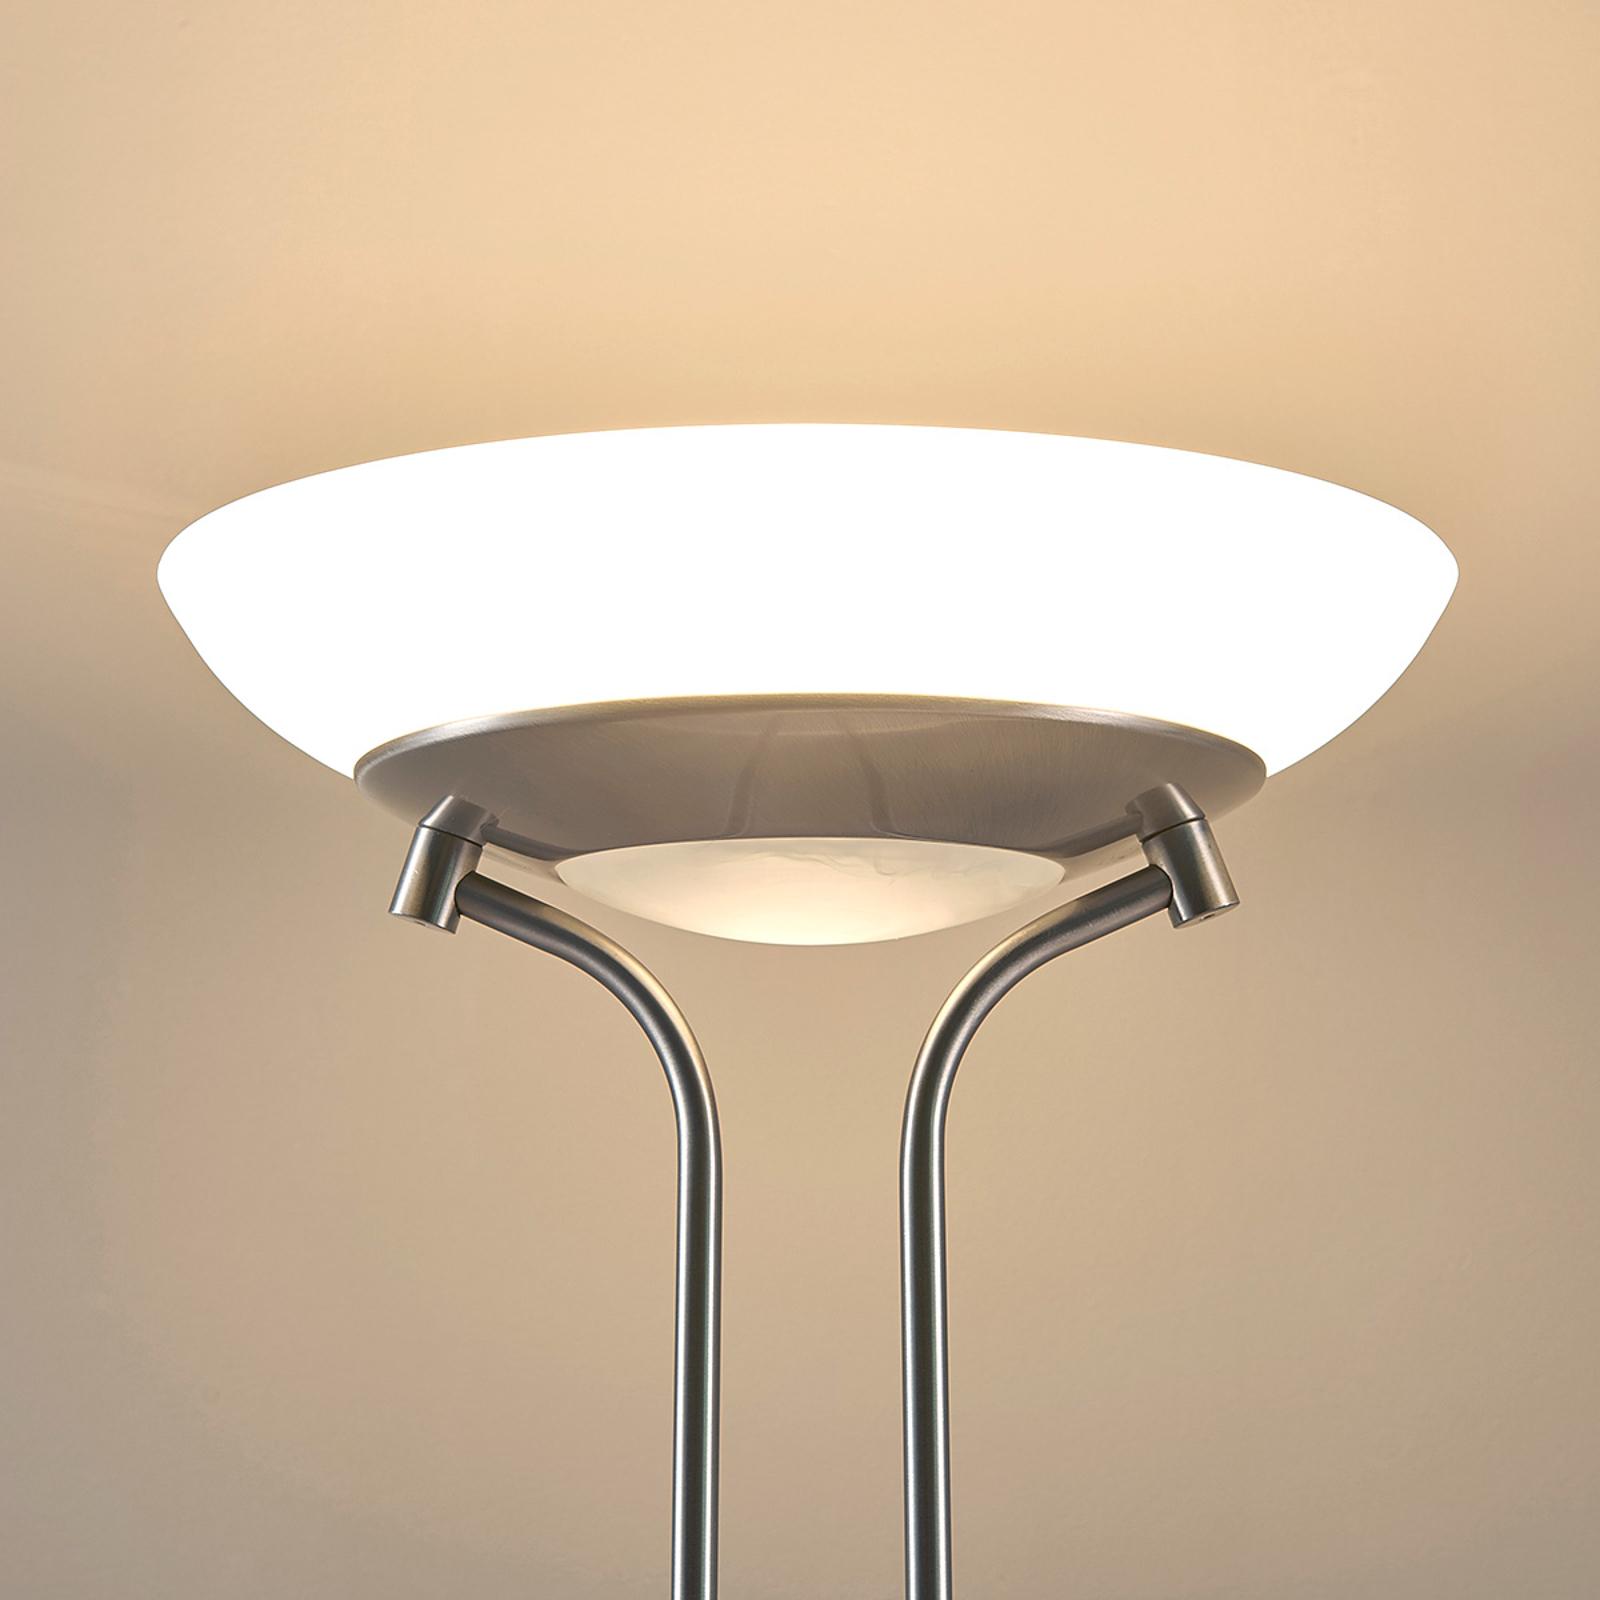 Yveta - lampada LED da terra con luce di lettura